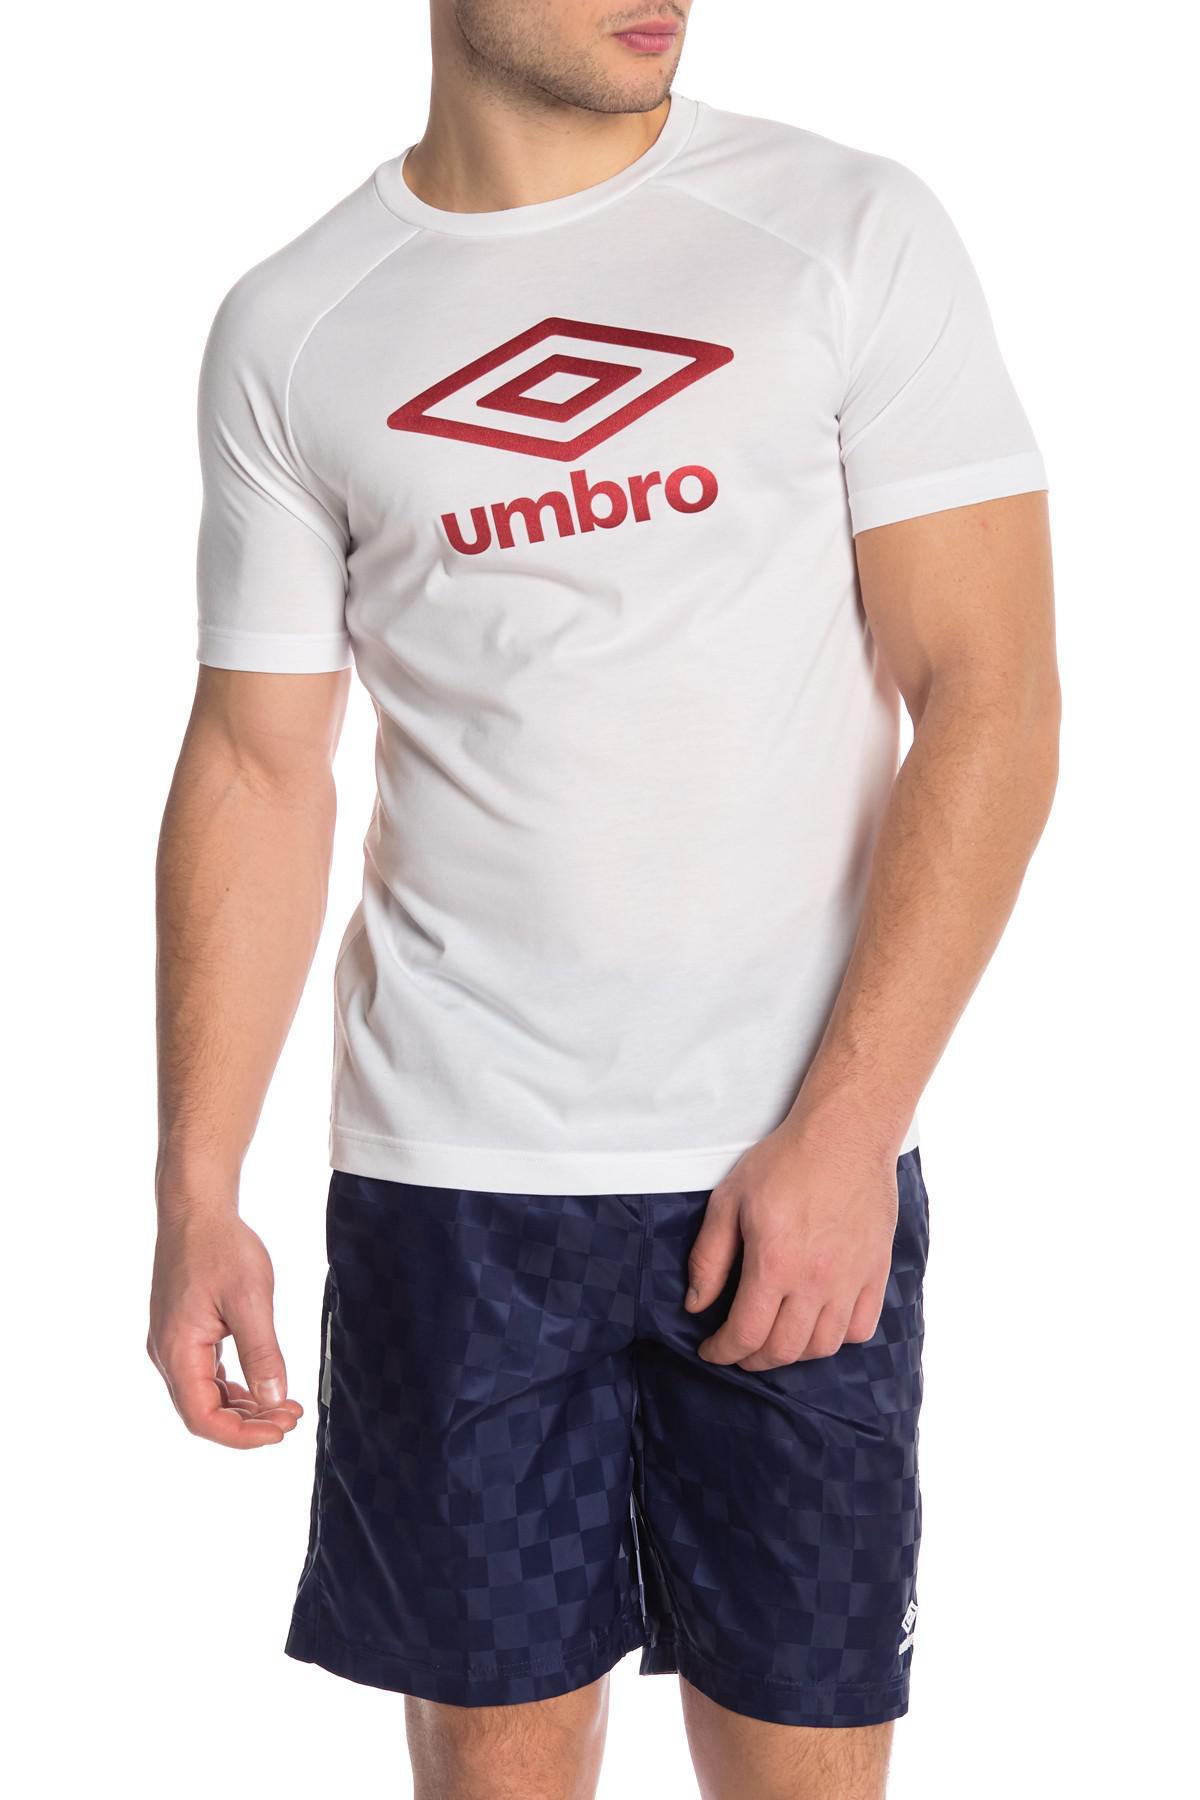 cb2afa7f00 Lyst - Umbro Short Sleeve Front Graphic Logo Print Tee in White for Men